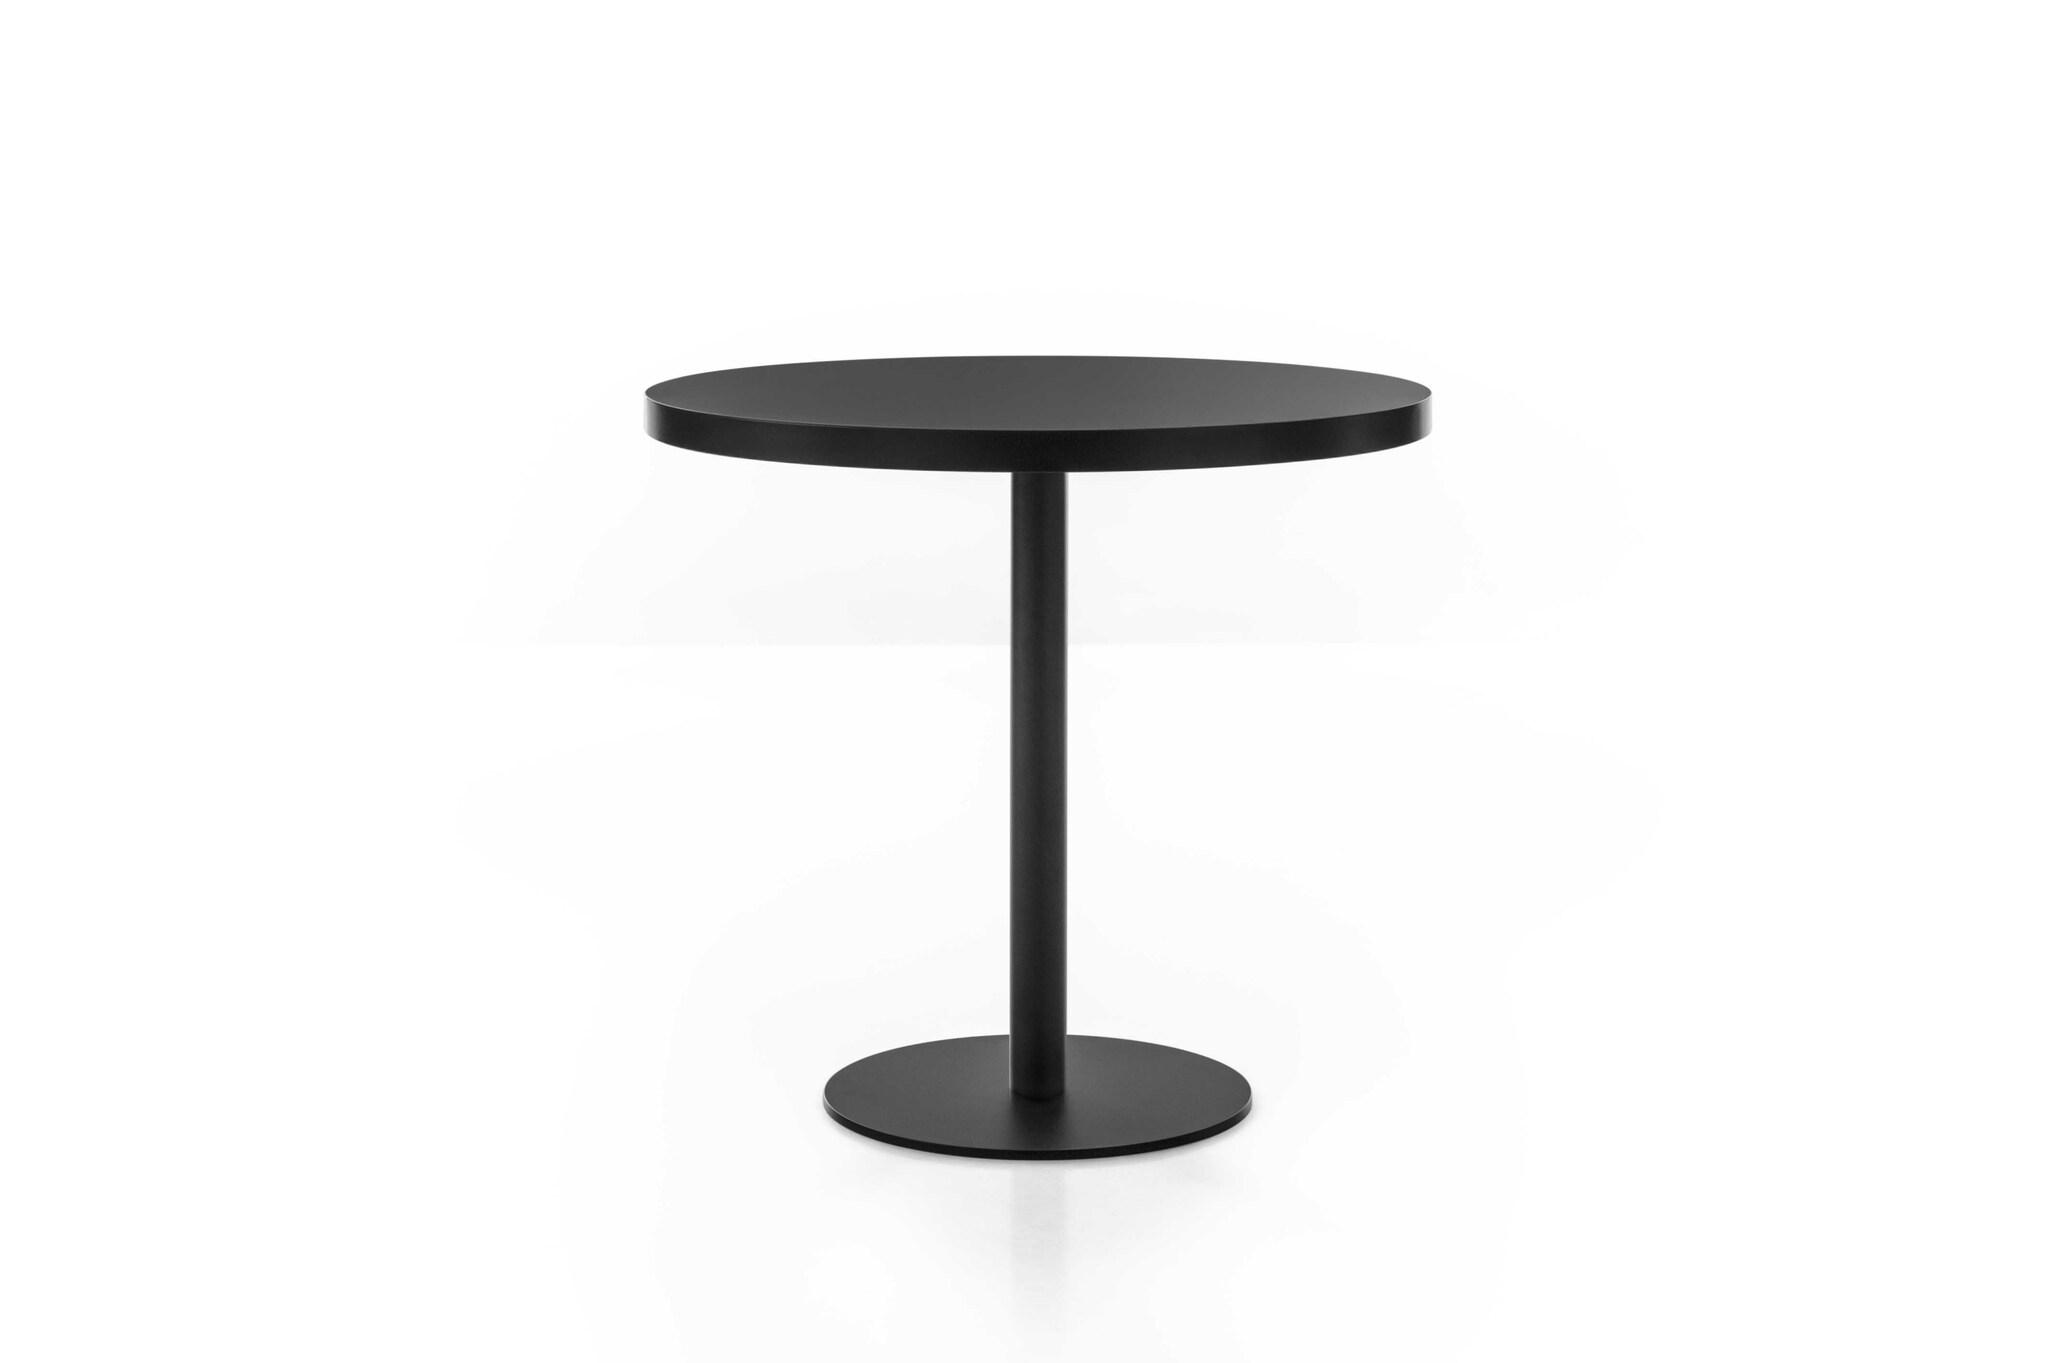 einzigartig table montante id es de conception de table basse. Black Bedroom Furniture Sets. Home Design Ideas